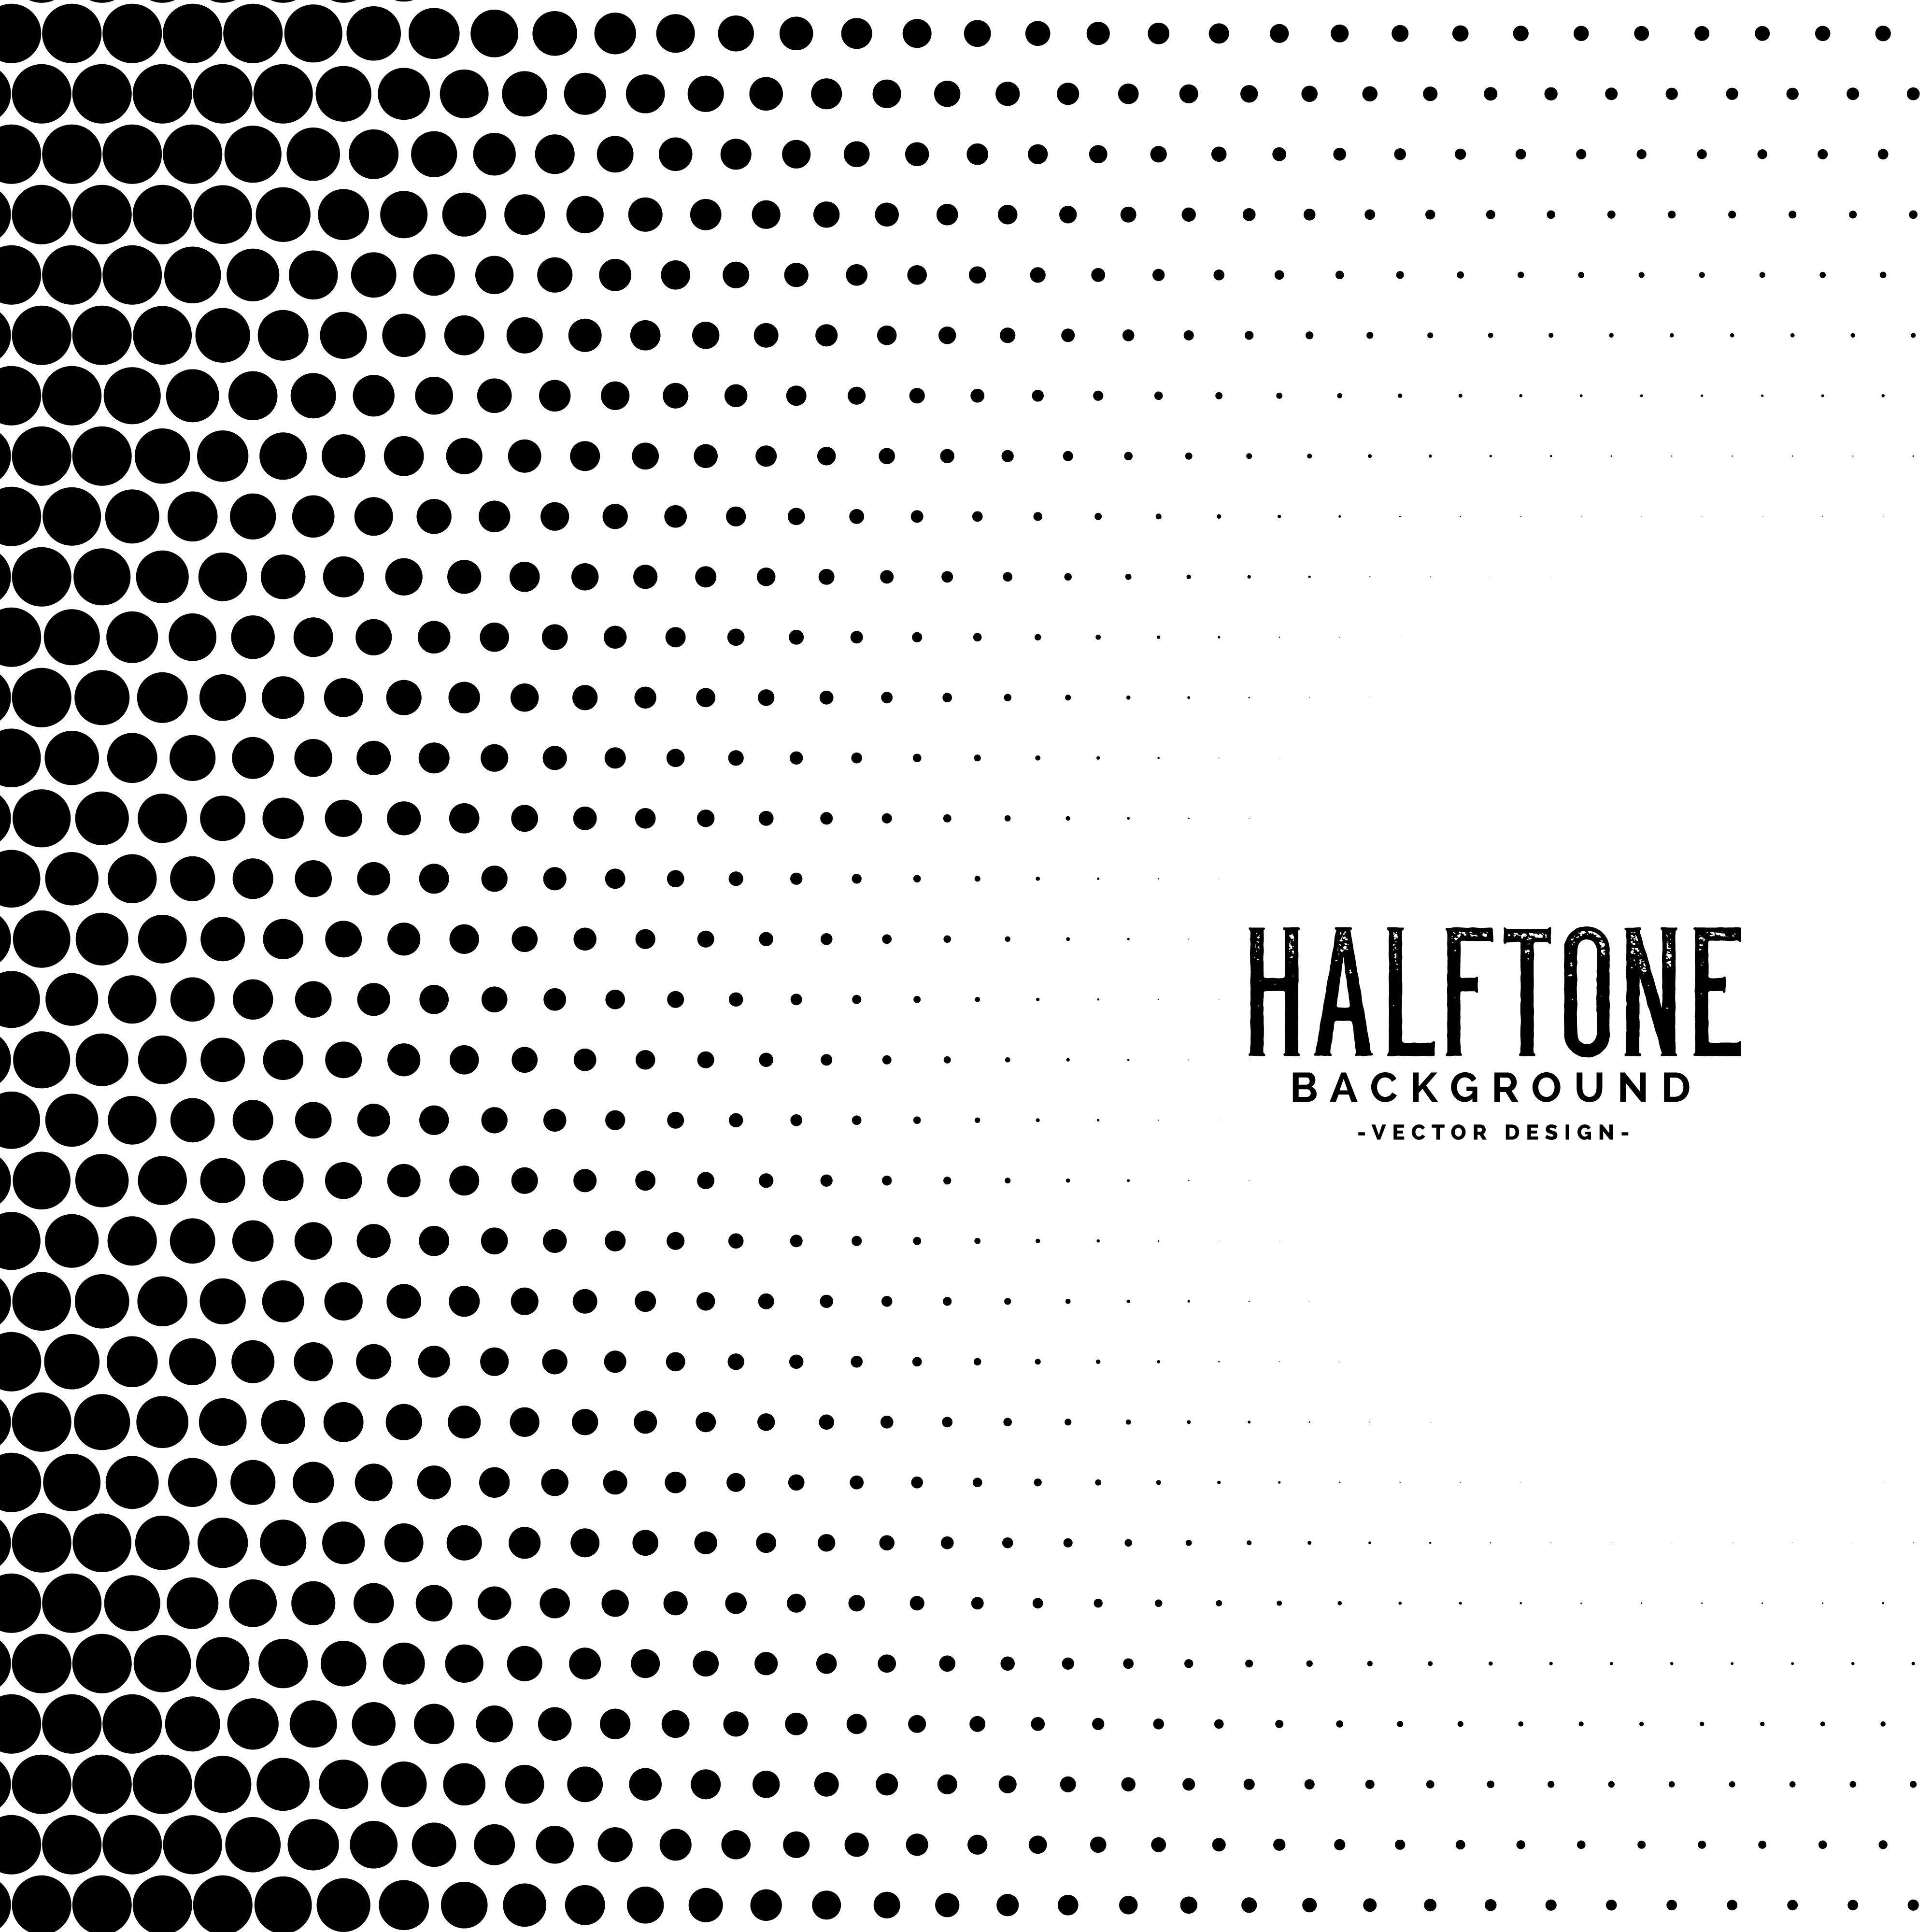 halftone gradient dots pattern background download free vector art stock graphics images. Black Bedroom Furniture Sets. Home Design Ideas